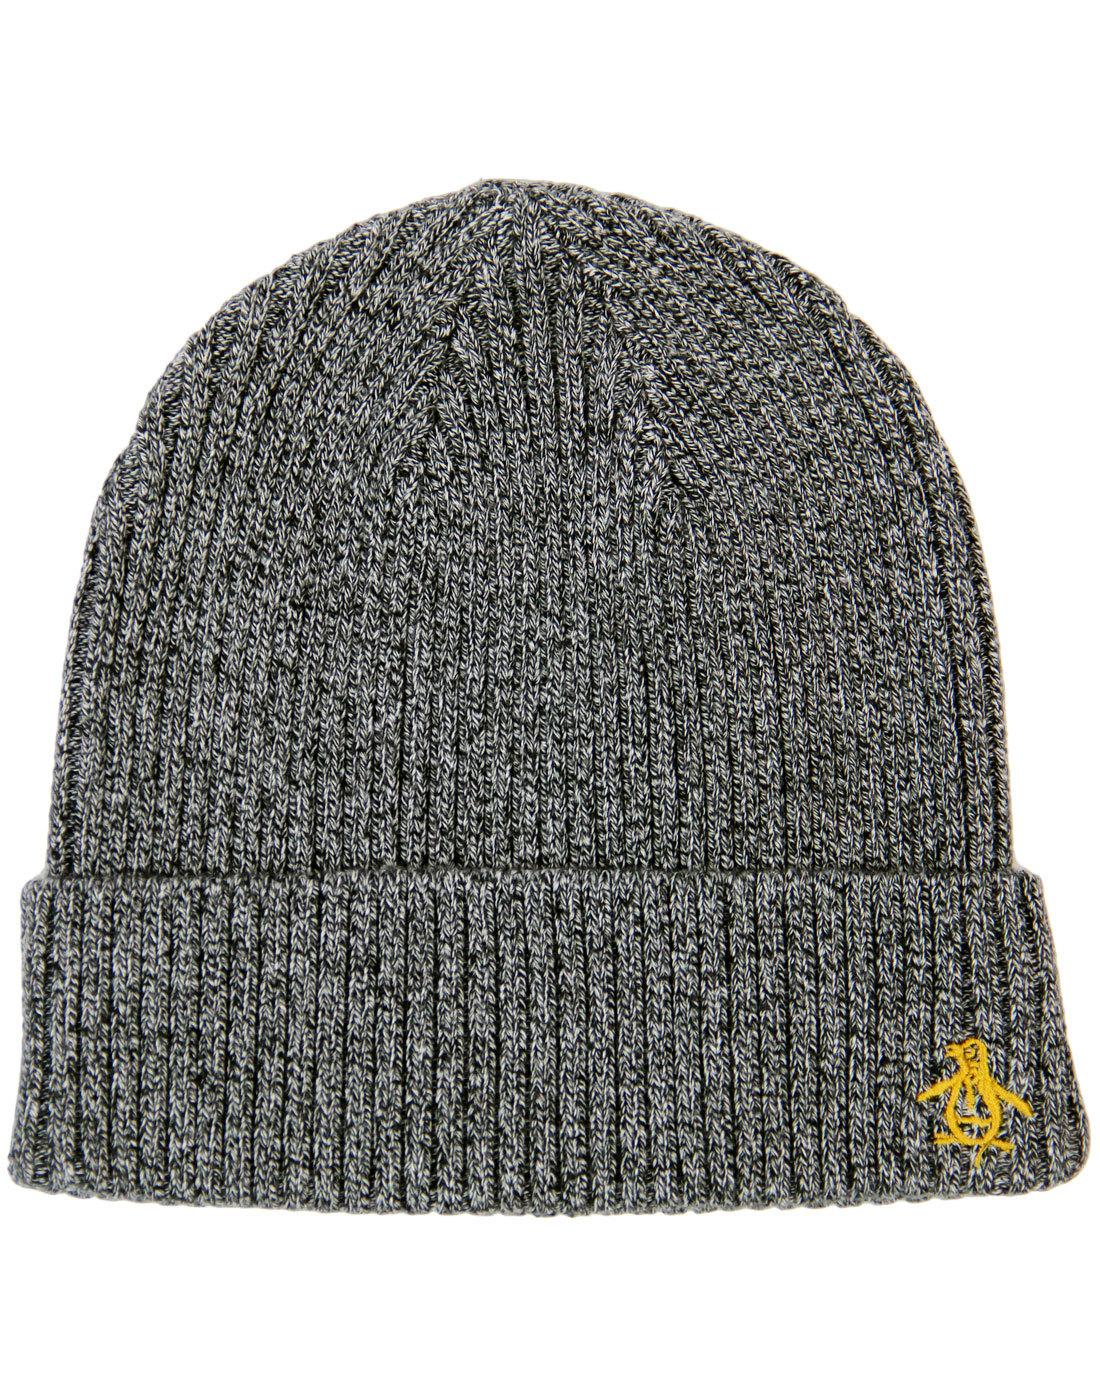 0e78337c7748d ORIGINAL PENGUIN Retro Twisted Yarn Ribbed Beanie Hat Dark Shadow